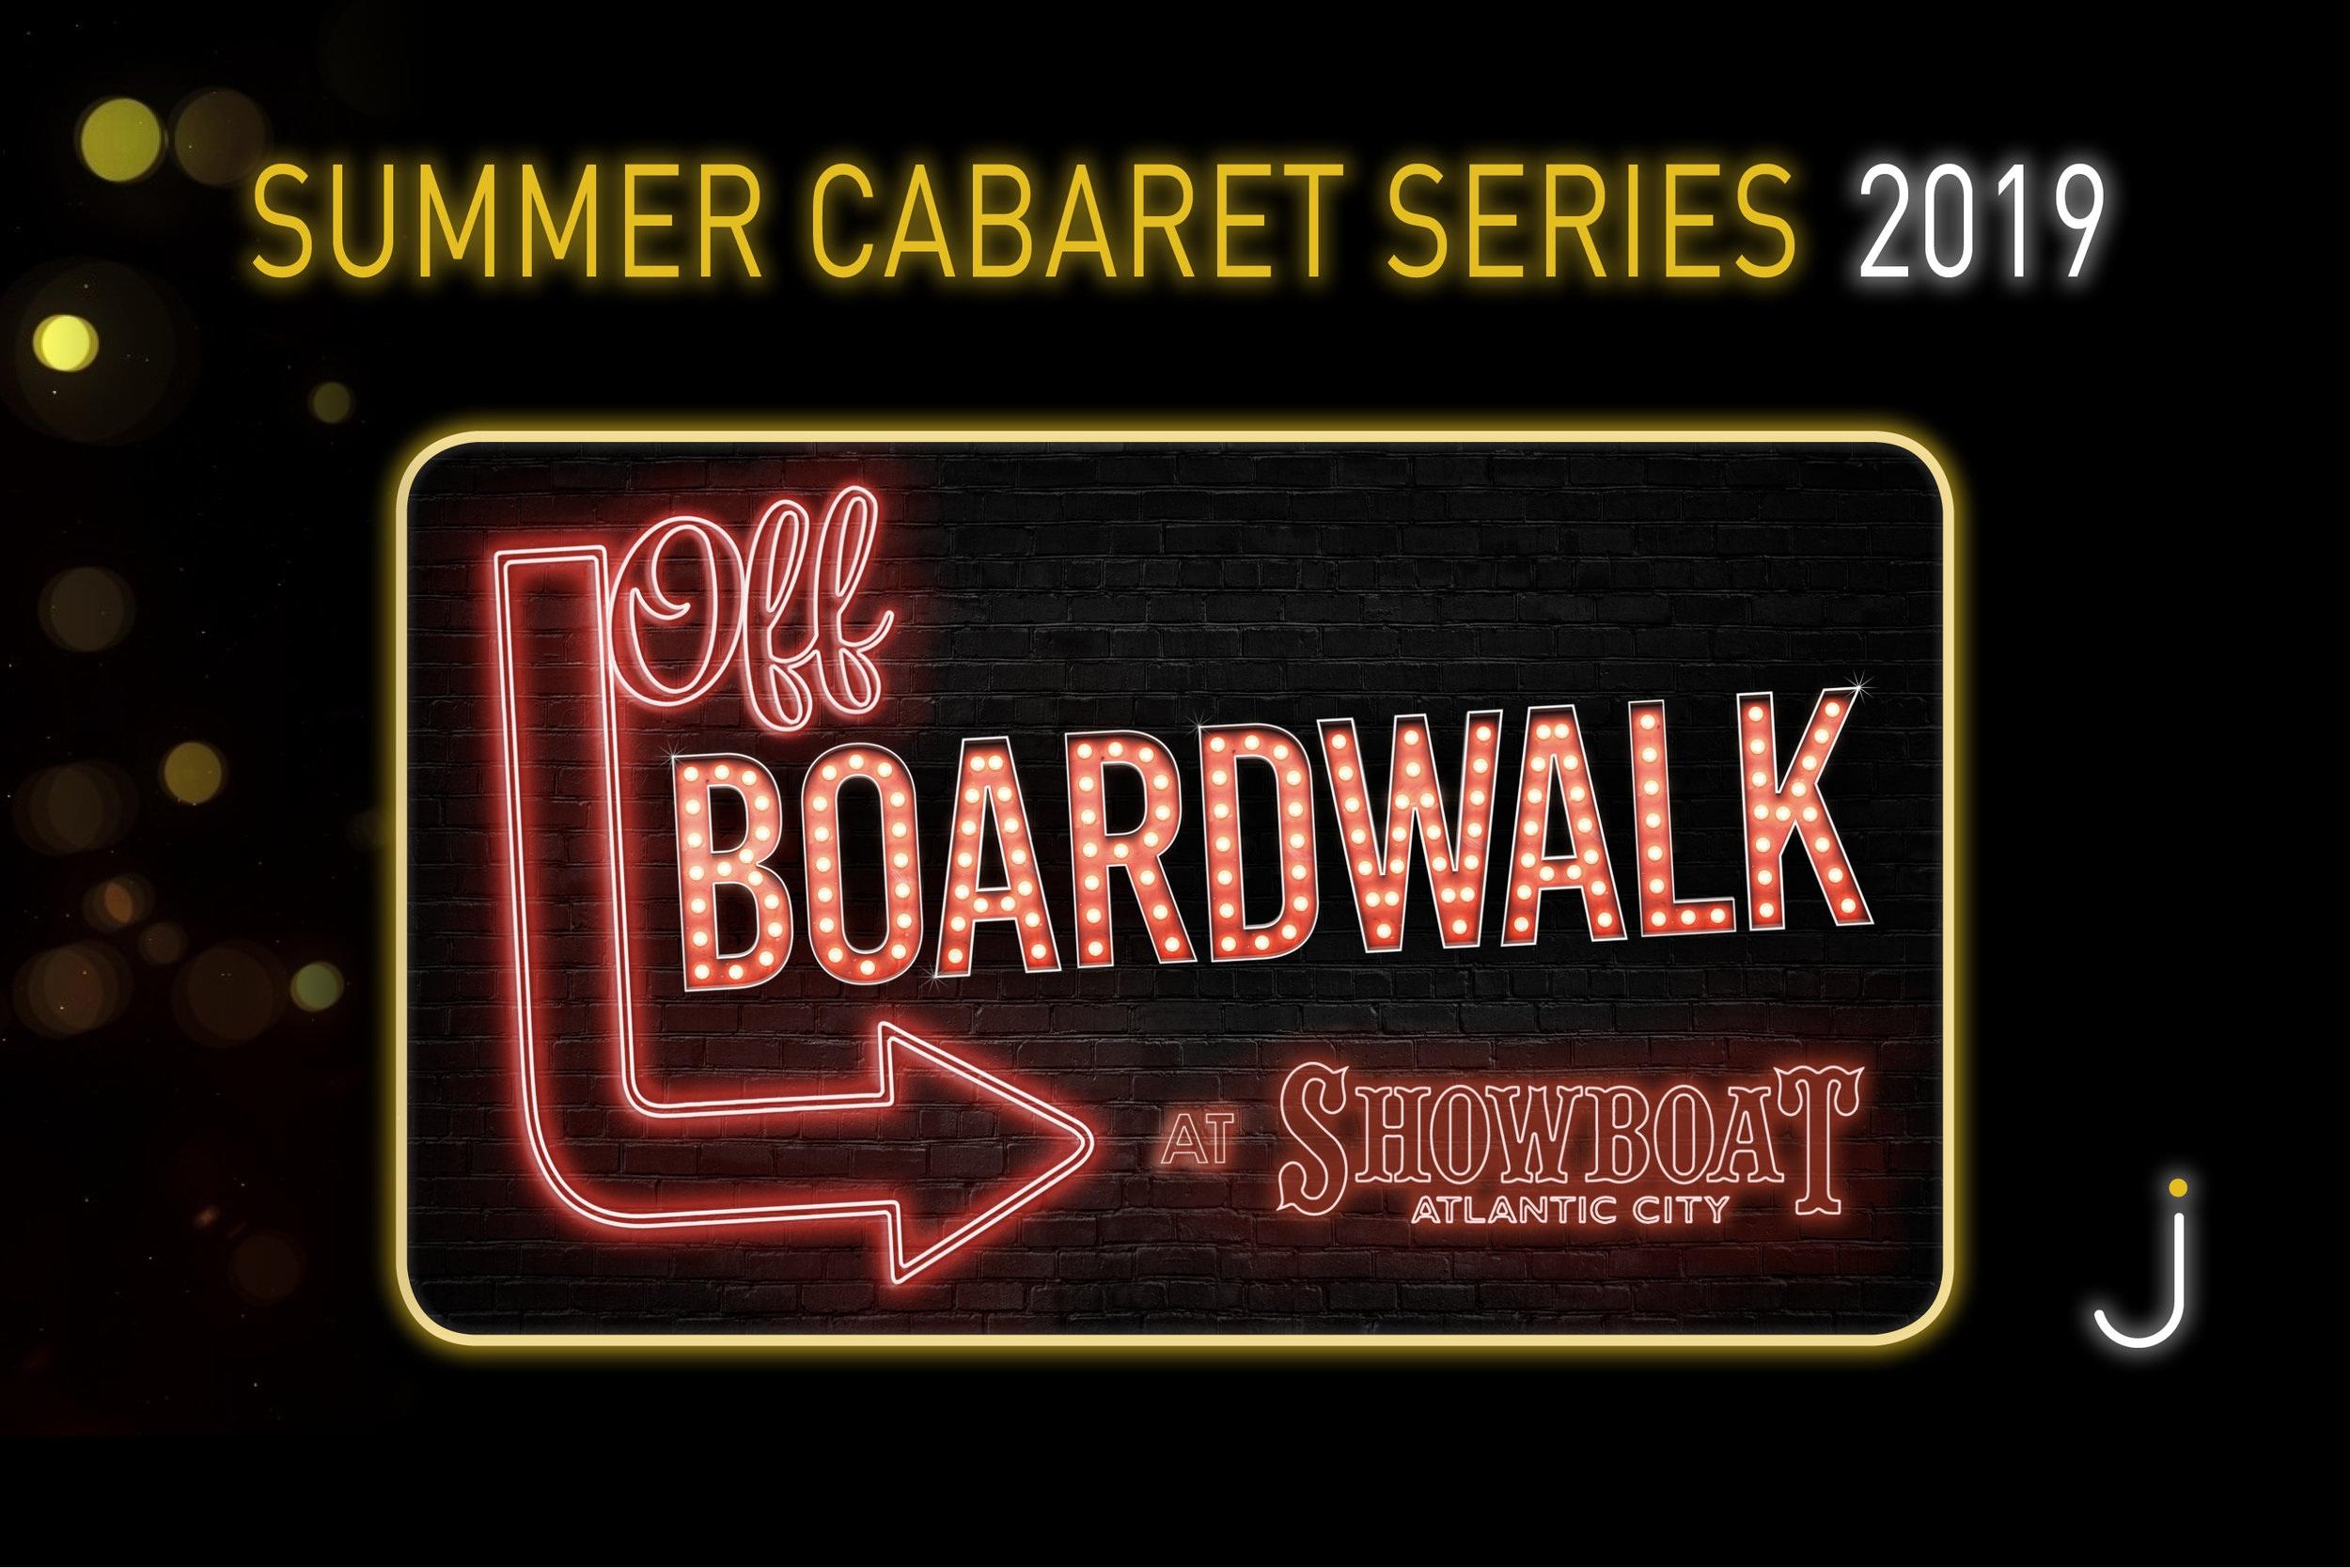 Friday nights July 5 - August 30 at Showboat Atlantic City